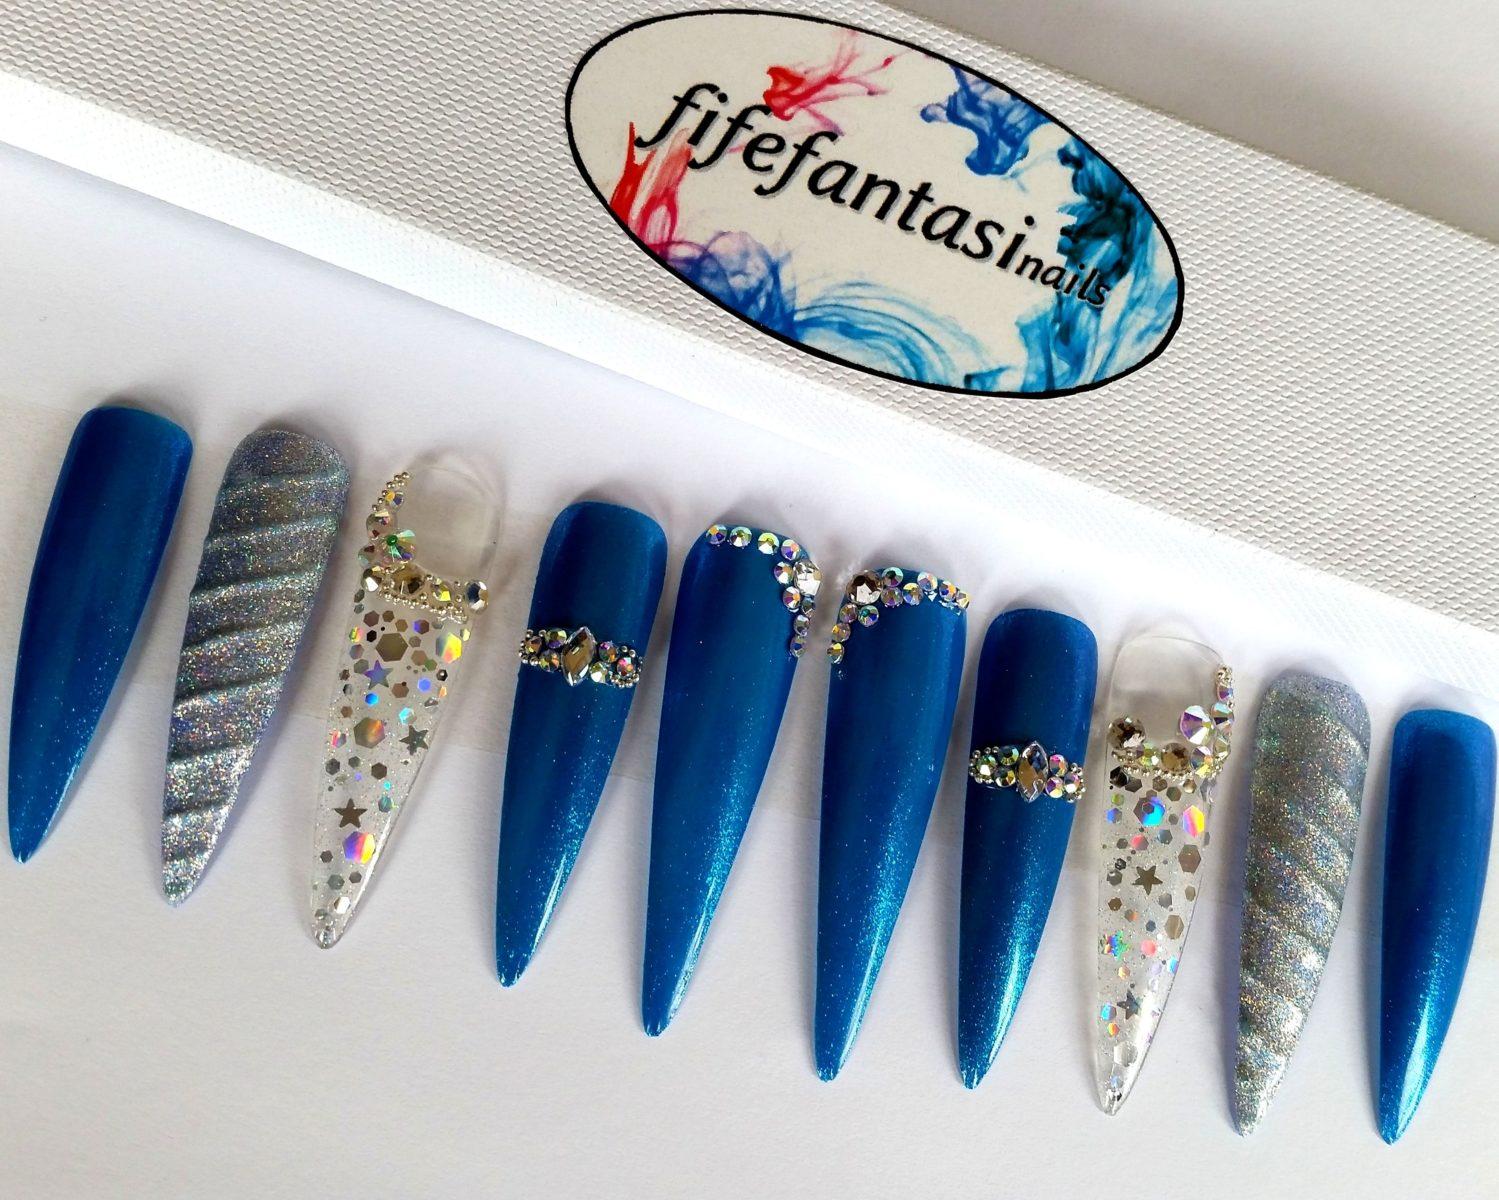 Mermaid Stiletto Nails – Fife Fantasi Nails